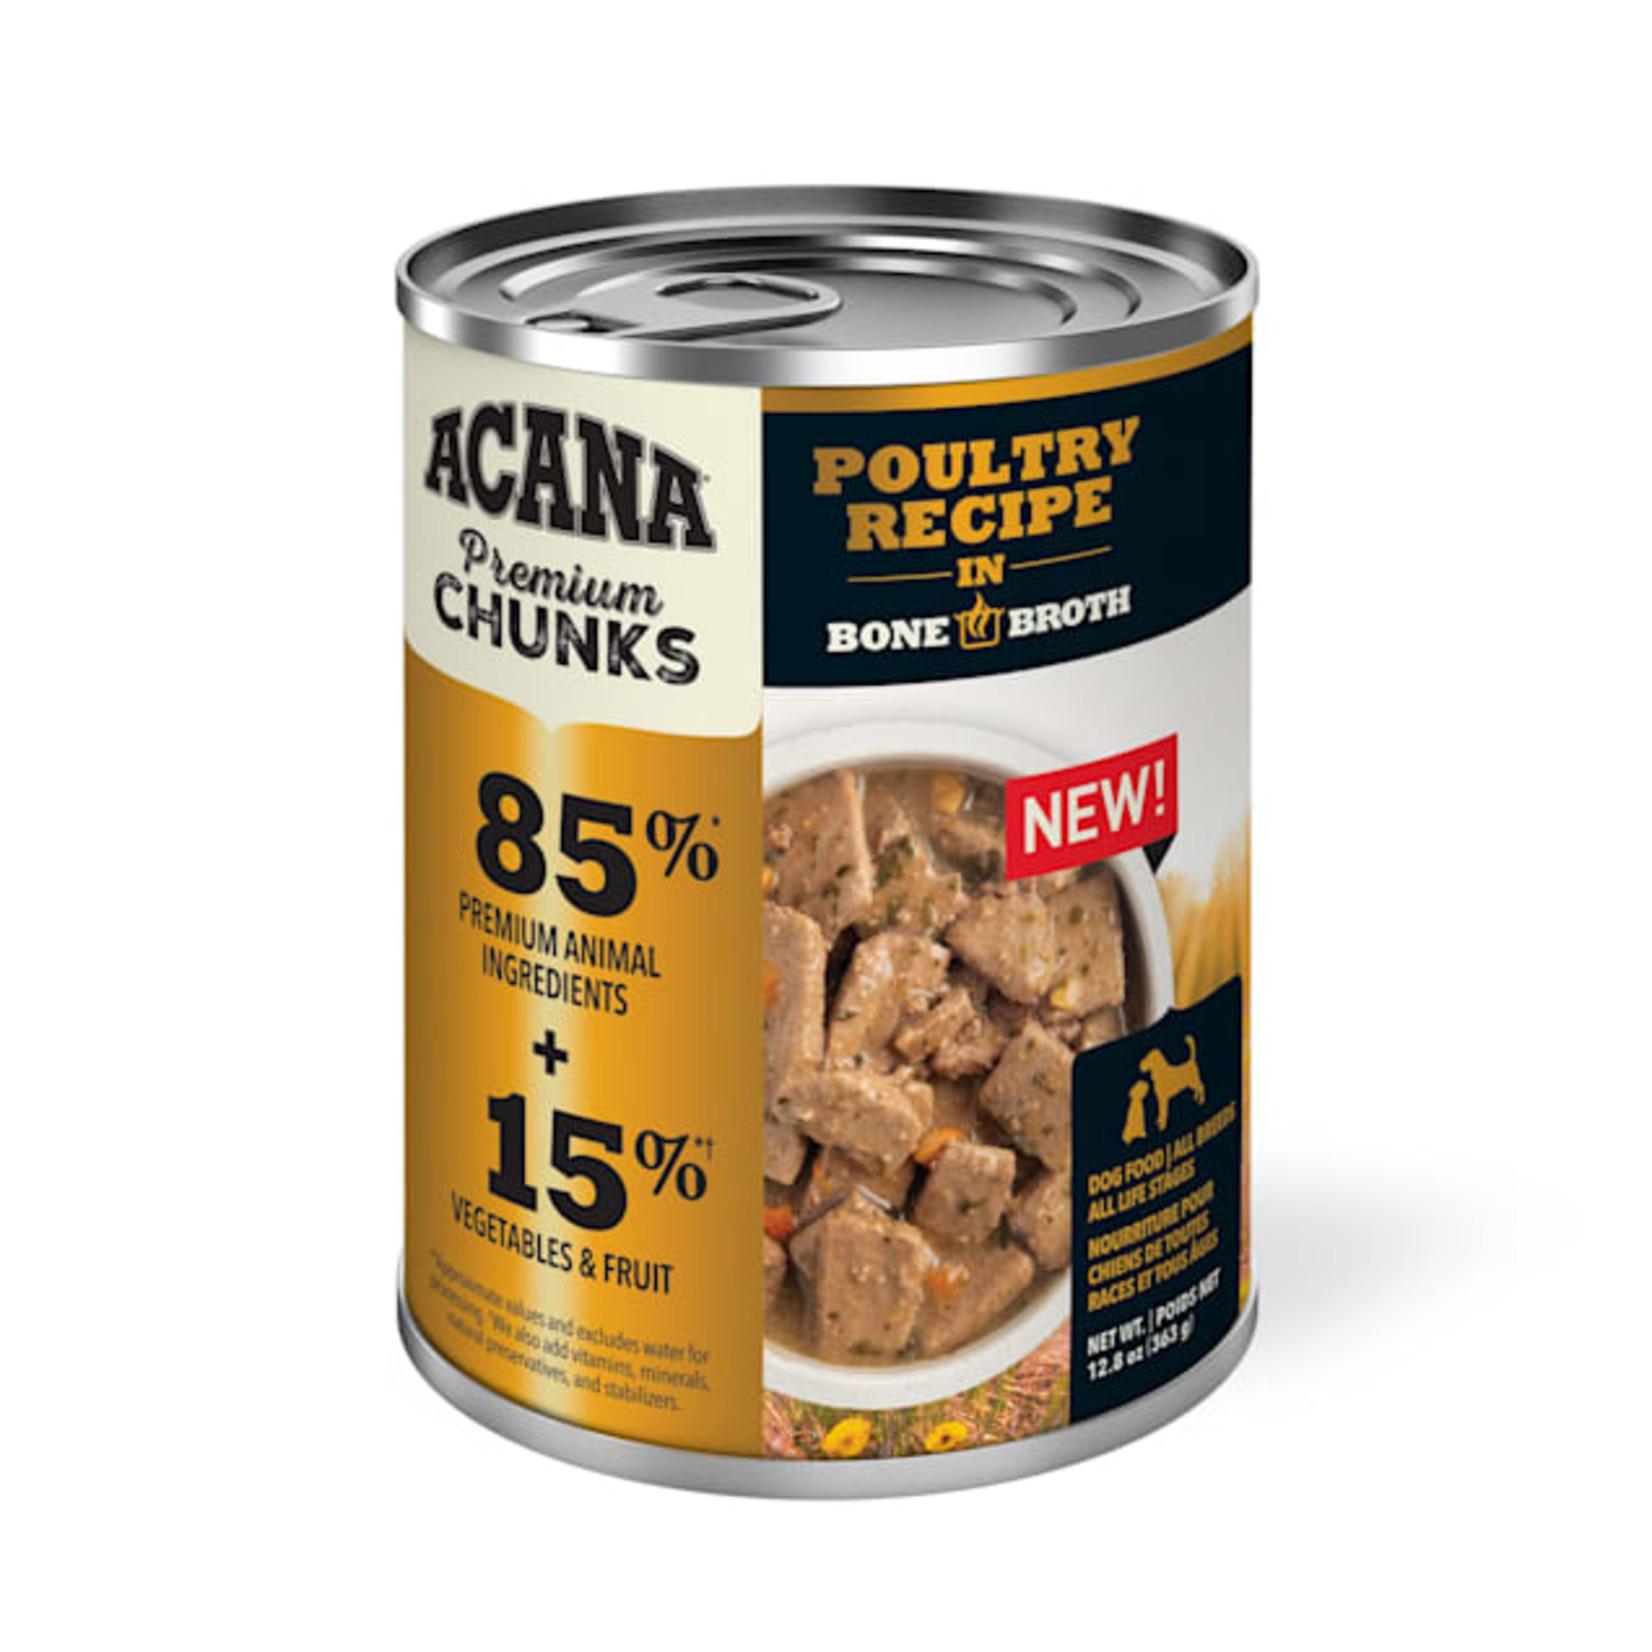 Acana Acana Poultry Recipe Dog Can 12.8 oz